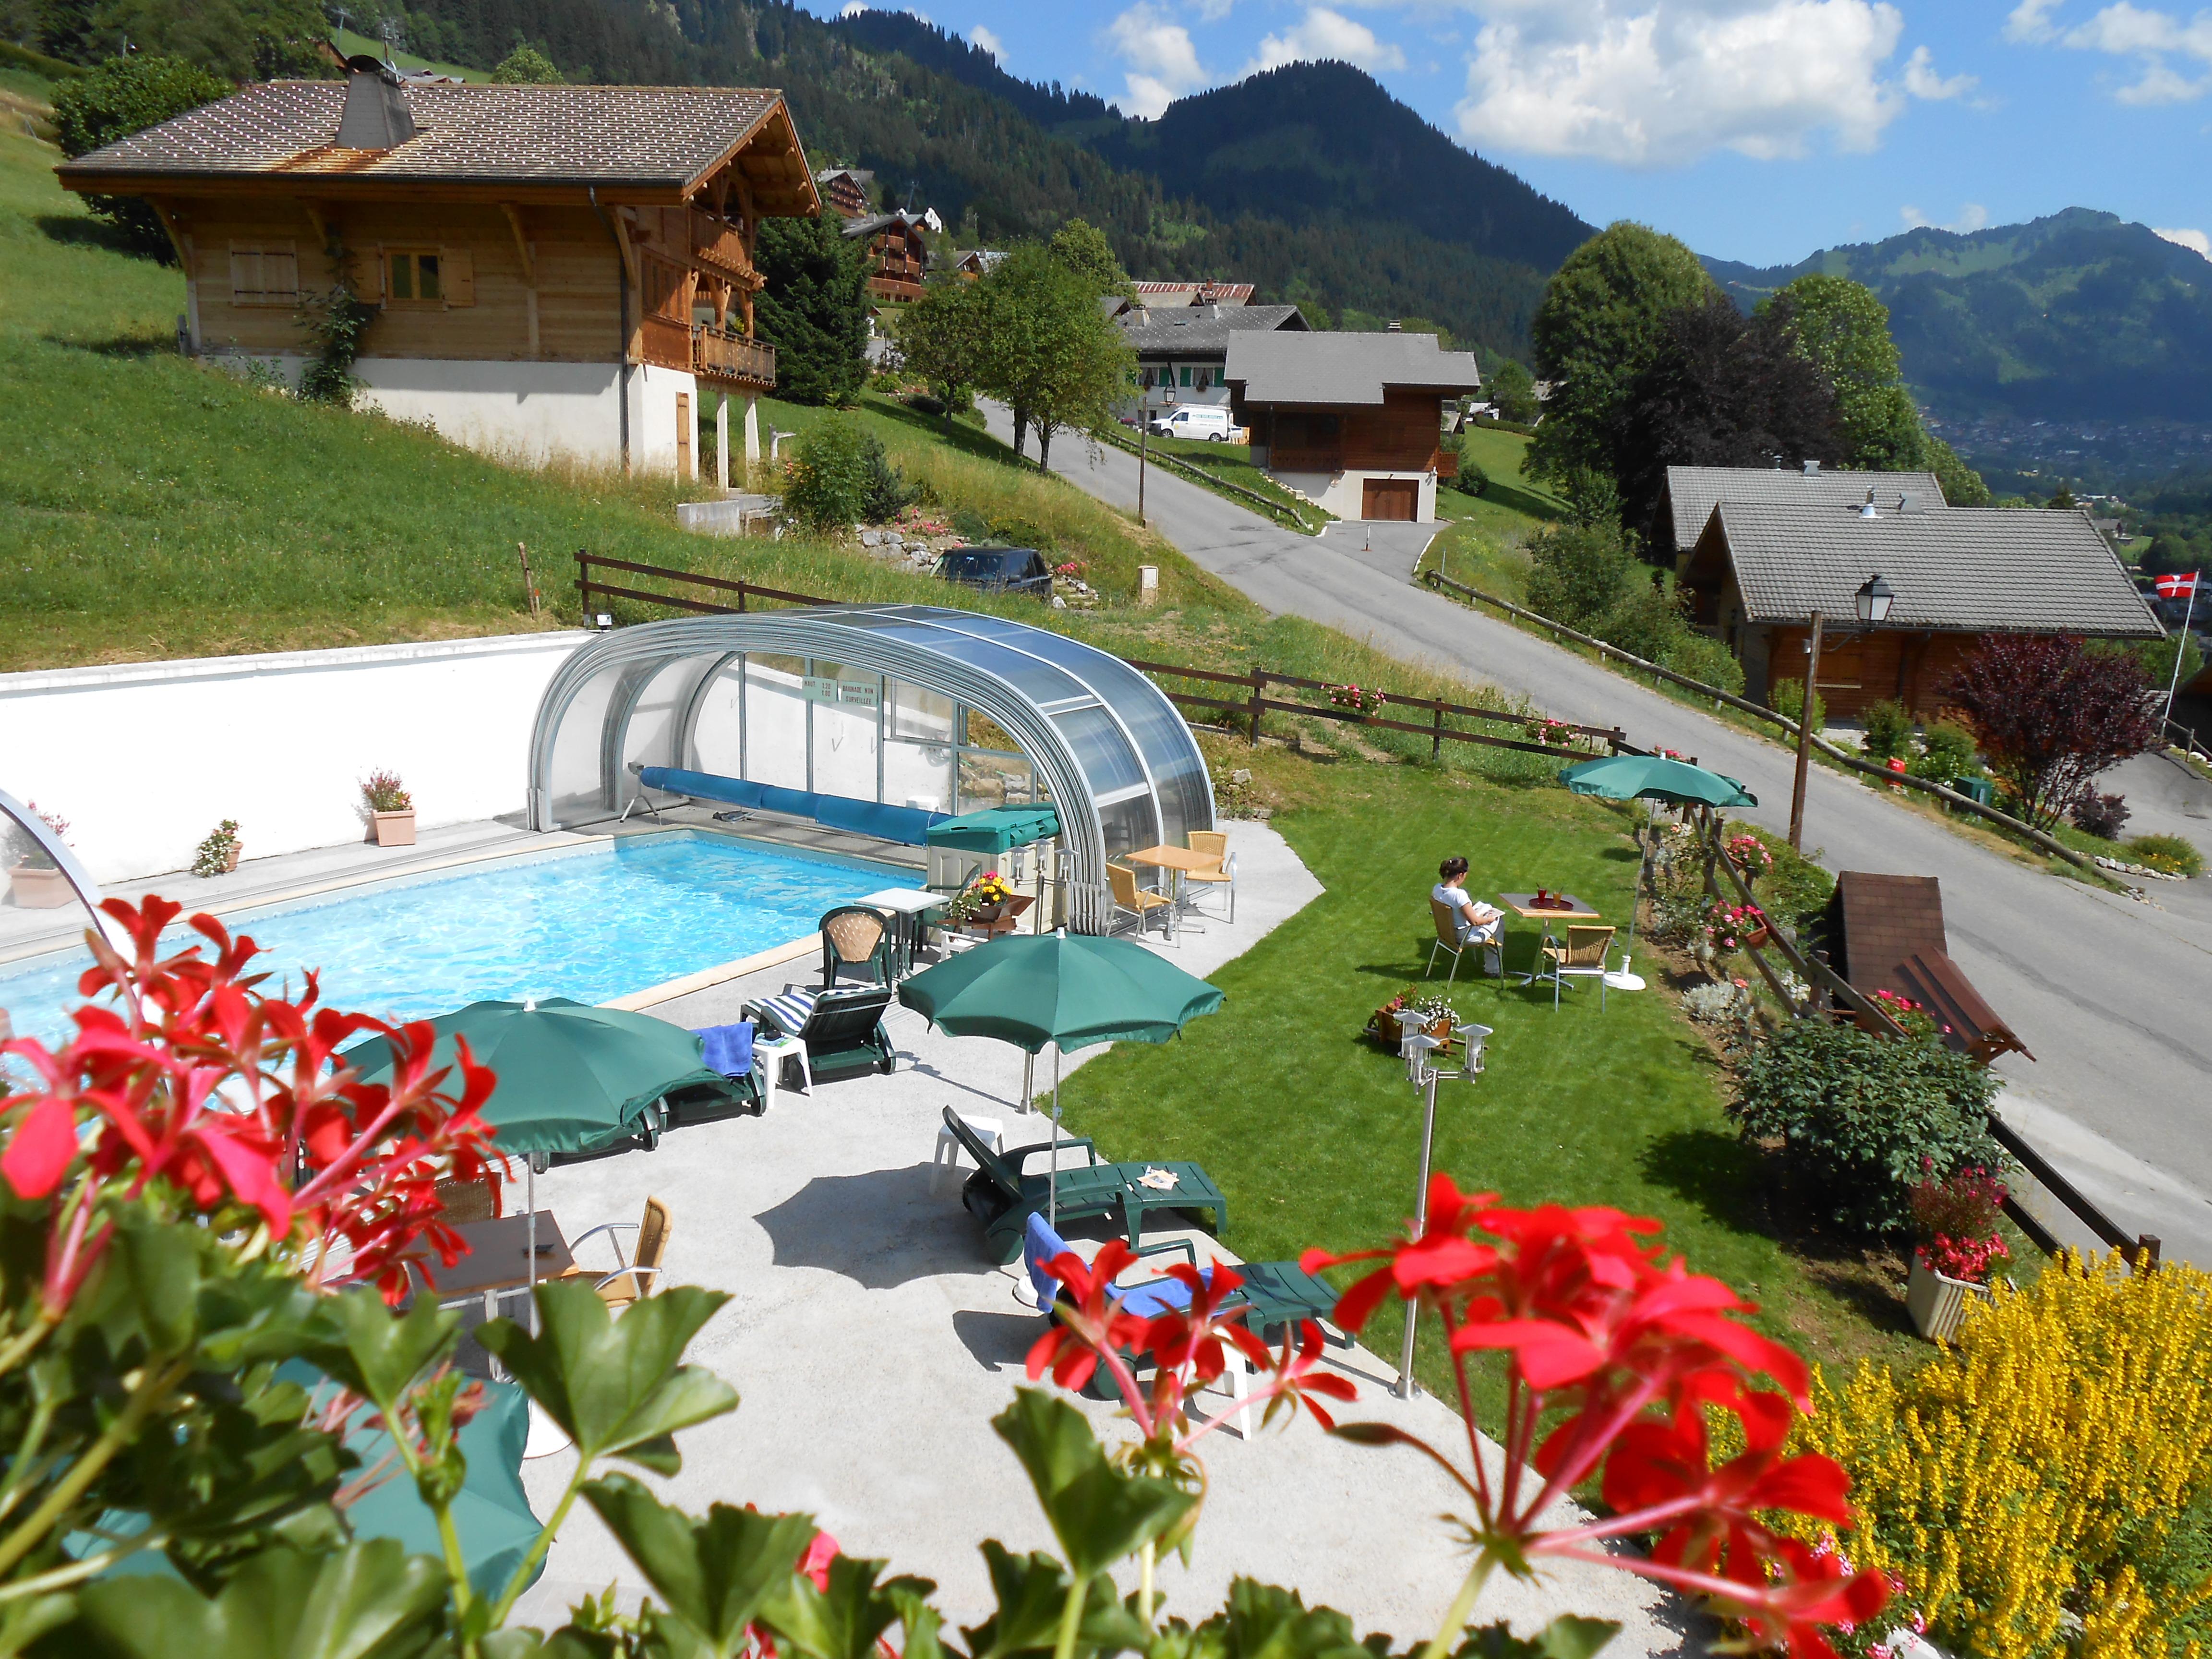 Hotel restaurant avec piscine et espace spa jacuzzi